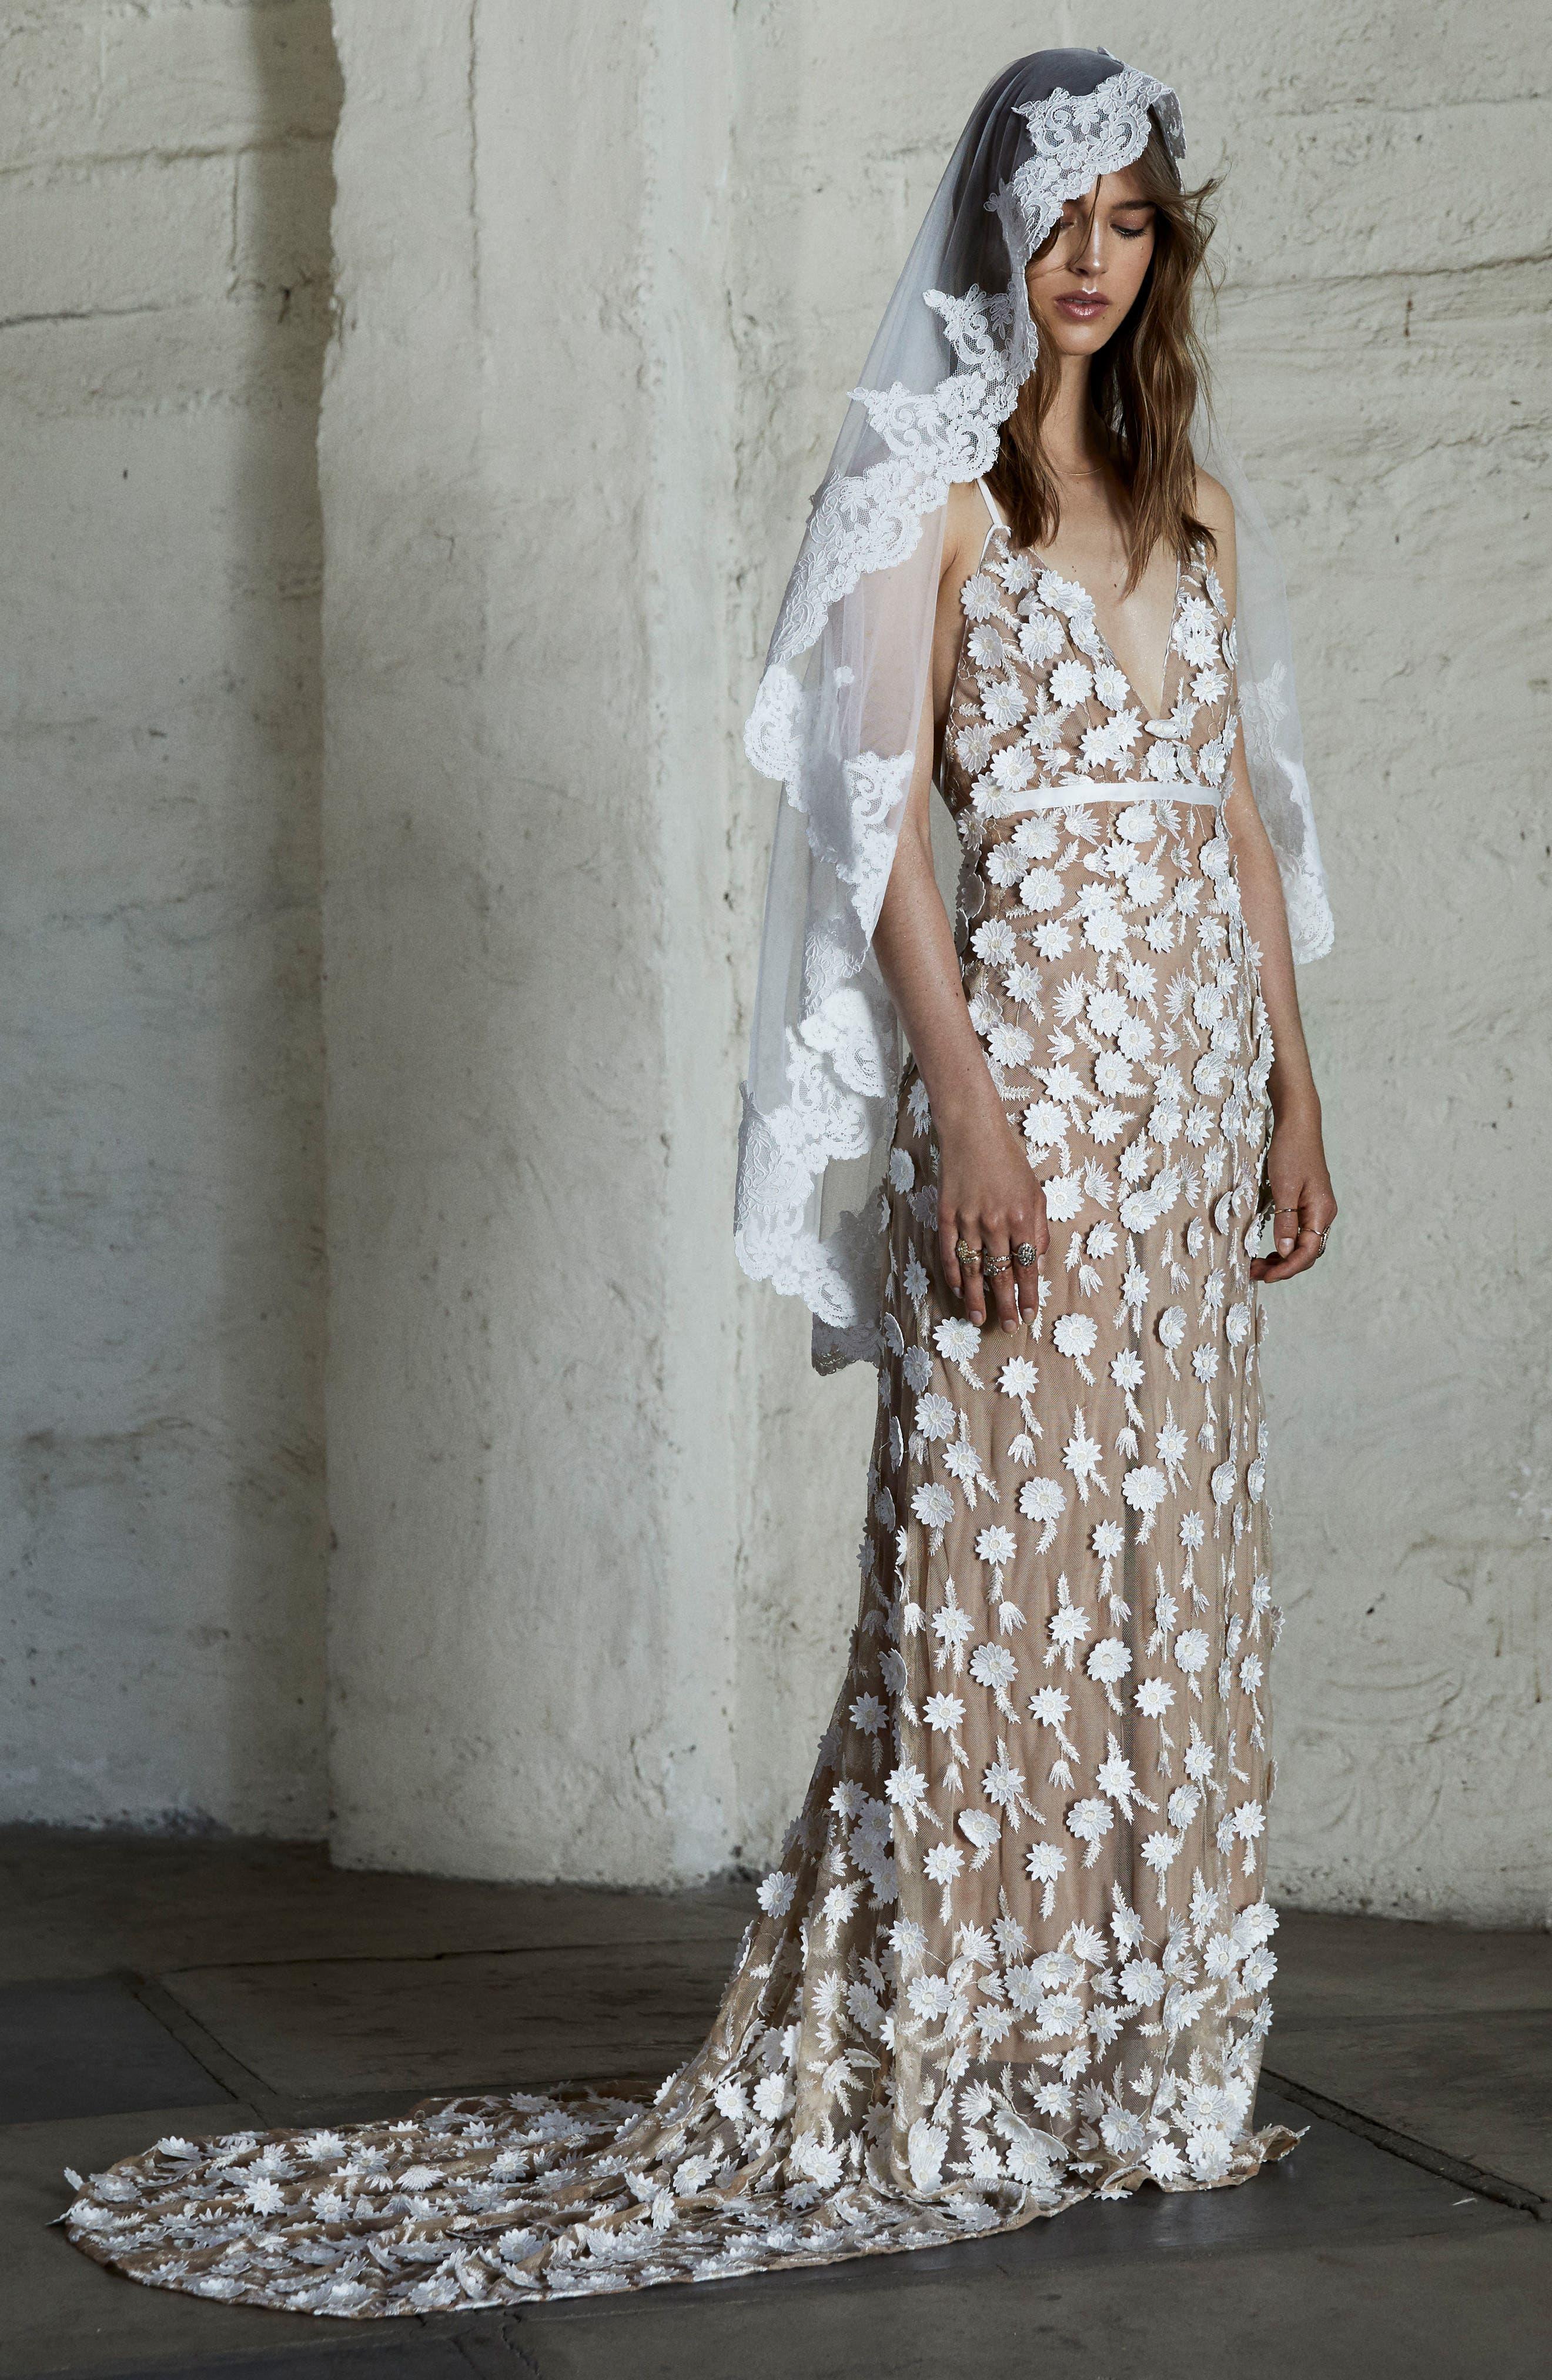 Alternate Image 1 Selected - For Love & Lemons Marguerite Floral Petal Gown